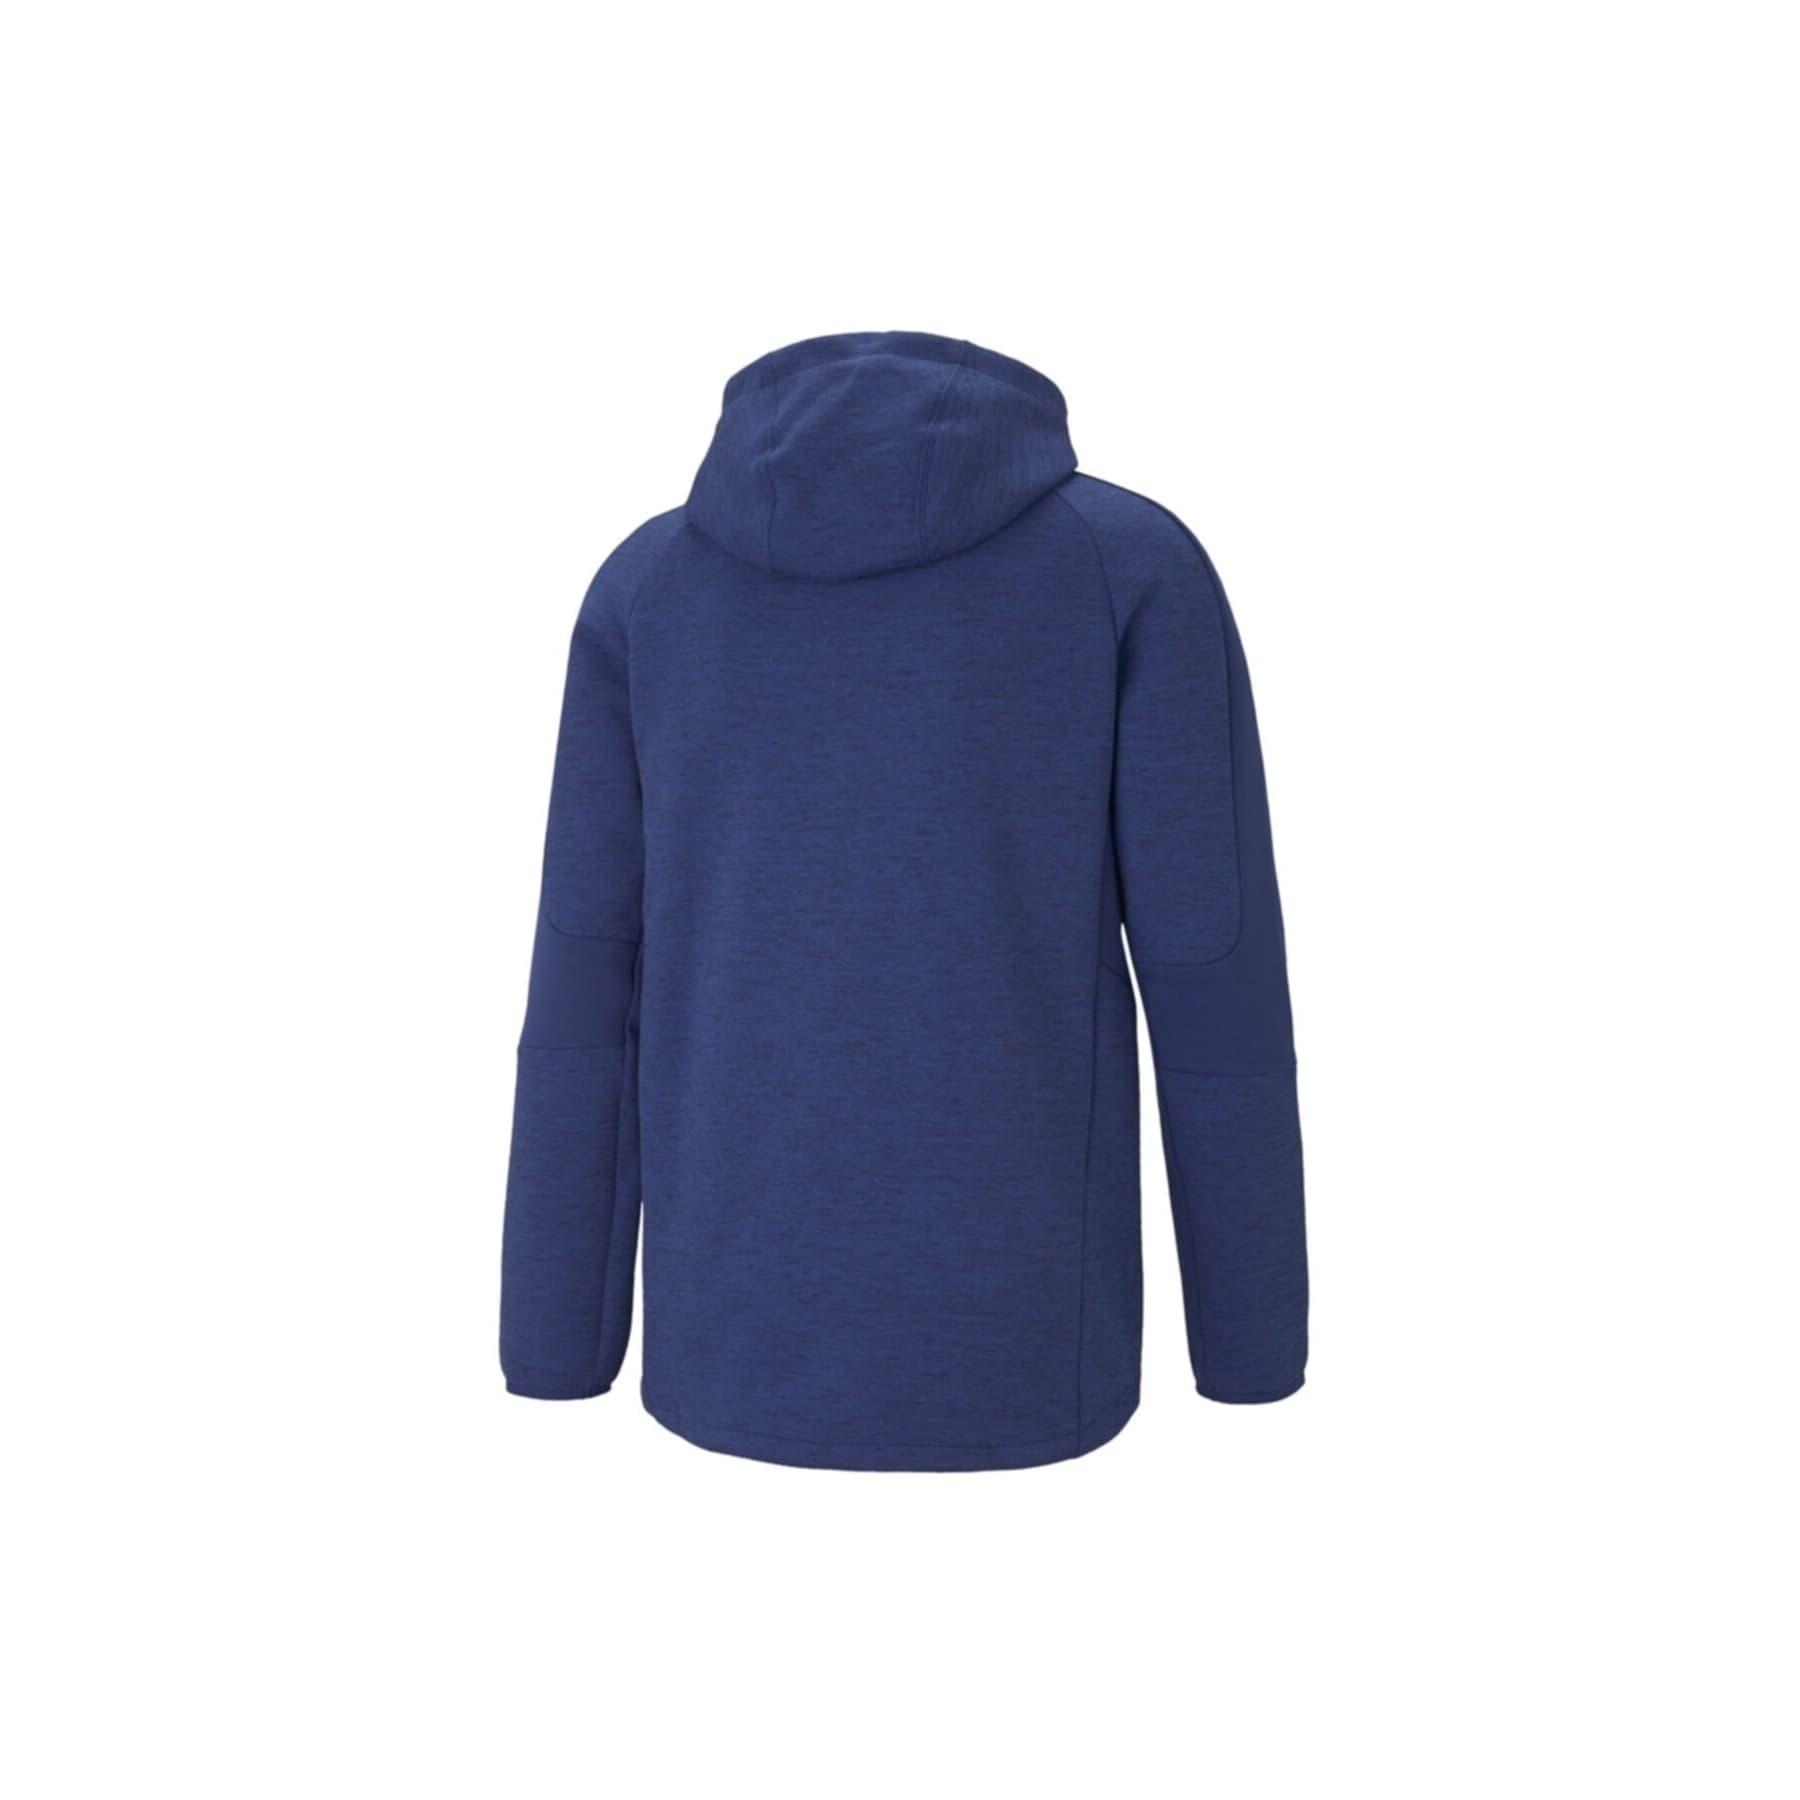 Evostripe Erkek Mavi Sweatshirt (585811-12)